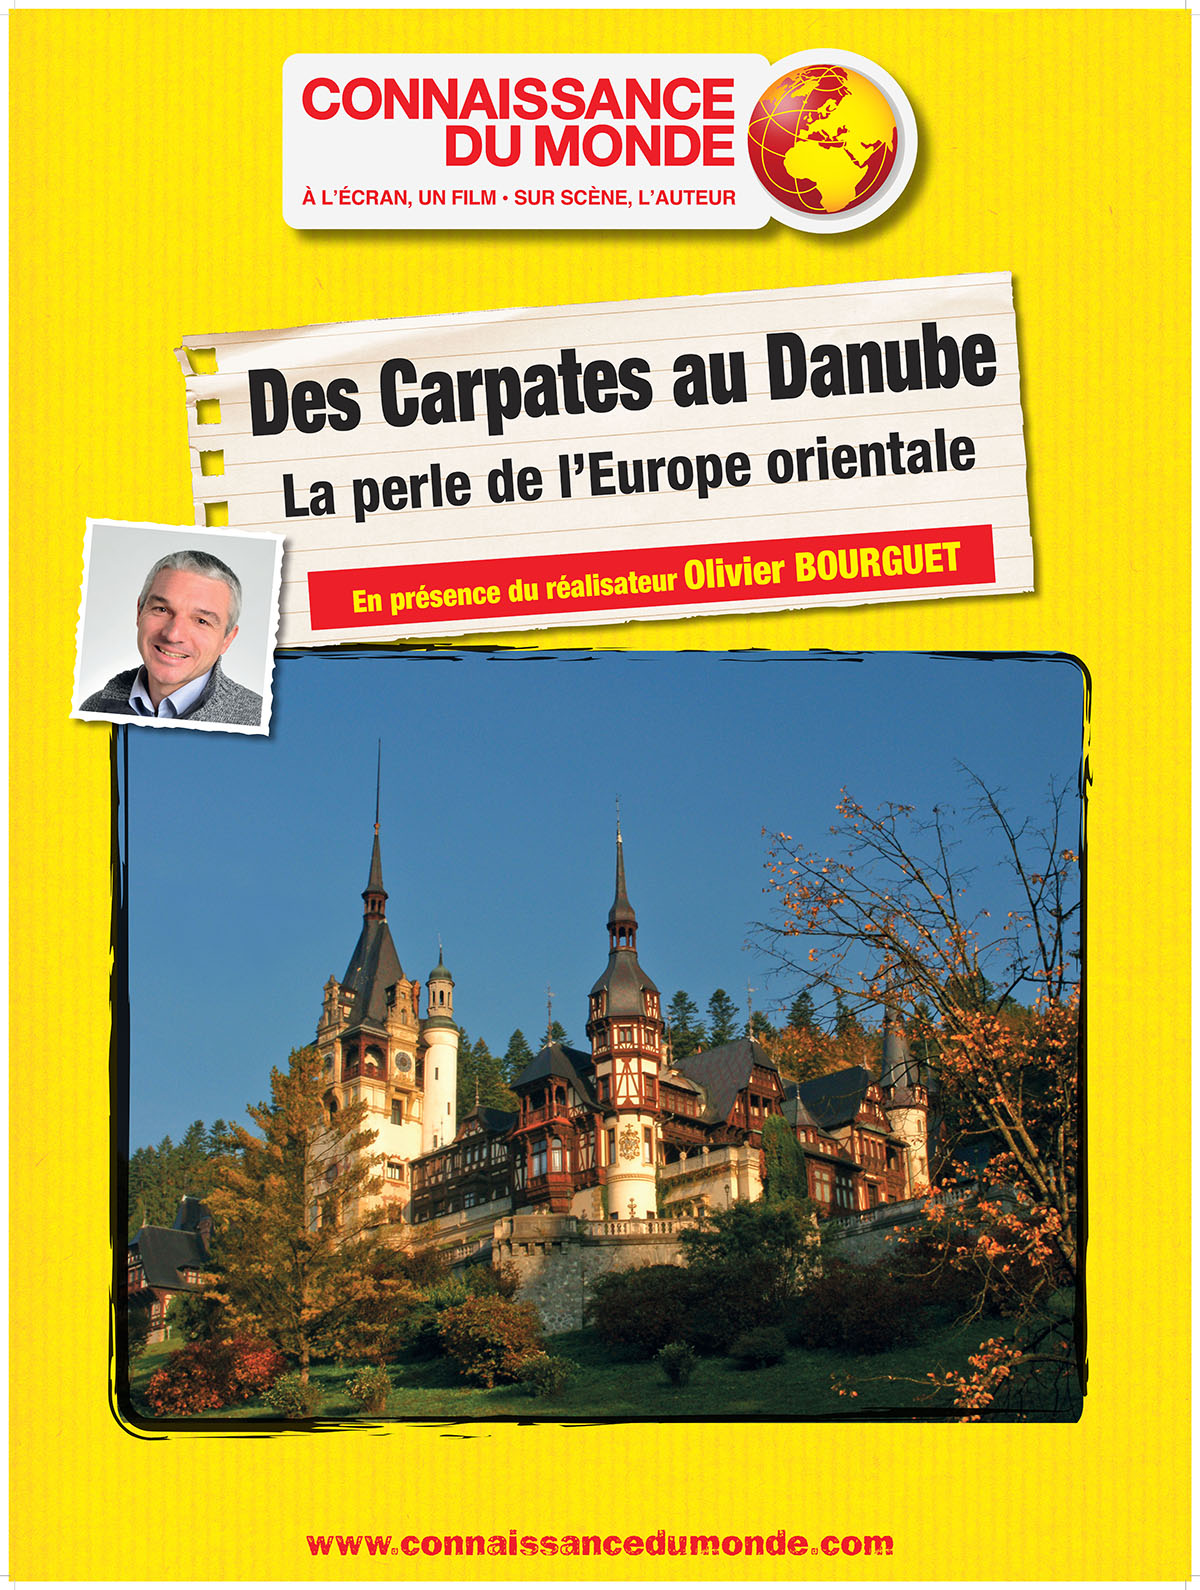 Des Carpates AU Danube, La Perle de l'Europe orientale